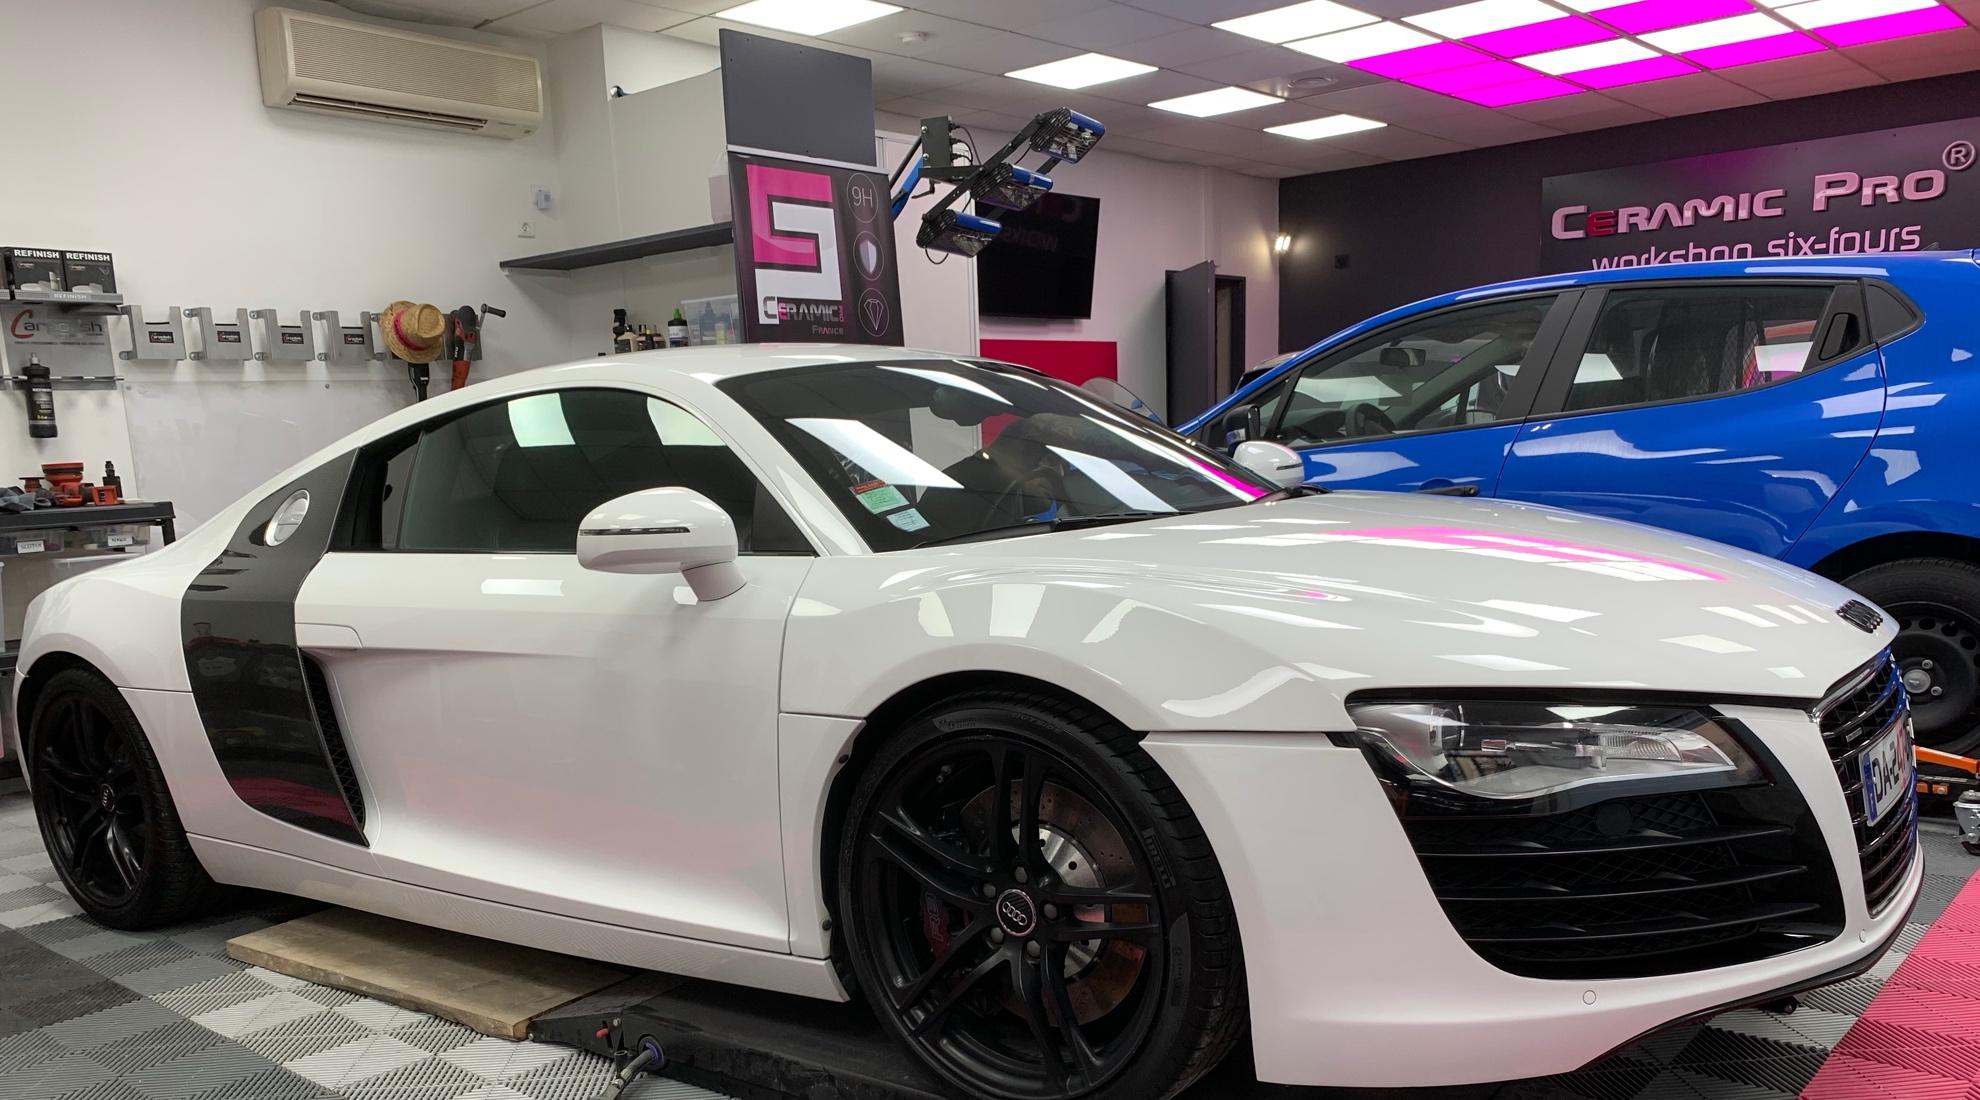 Polish_Audi_R8